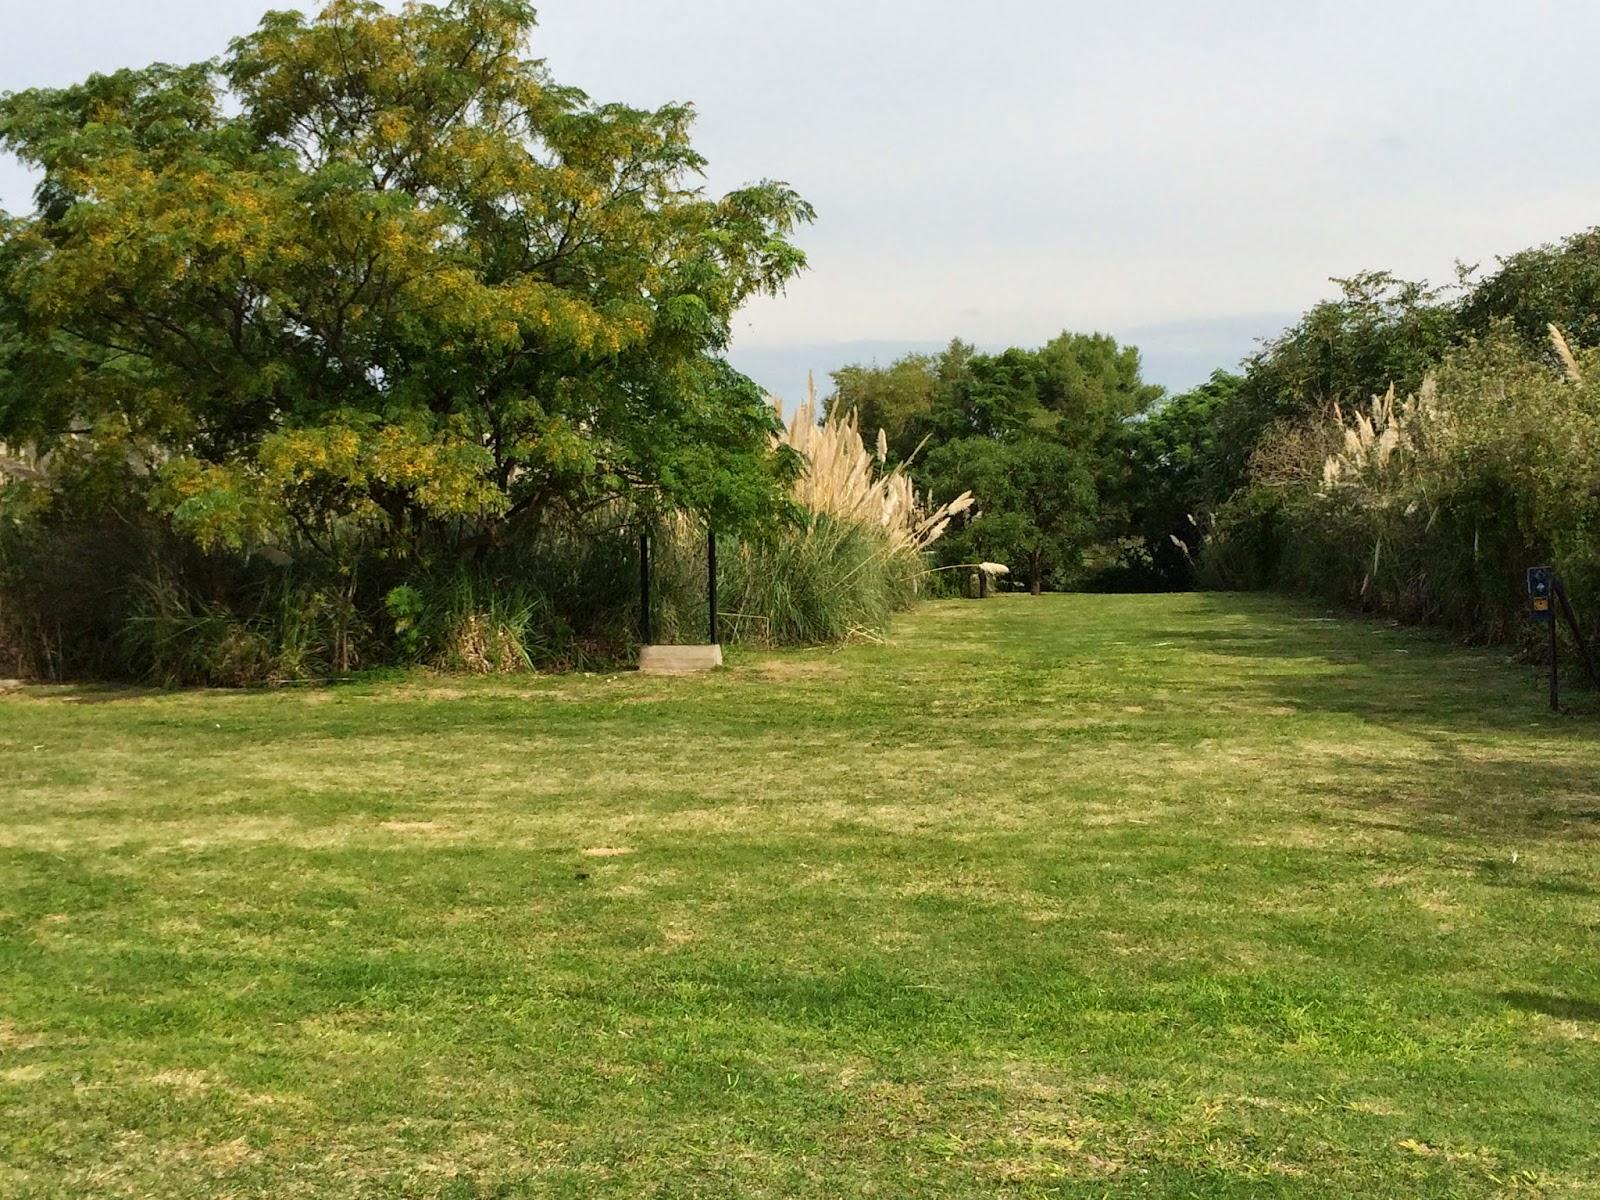 park_reserva_ecologica_argentina_4.jpg